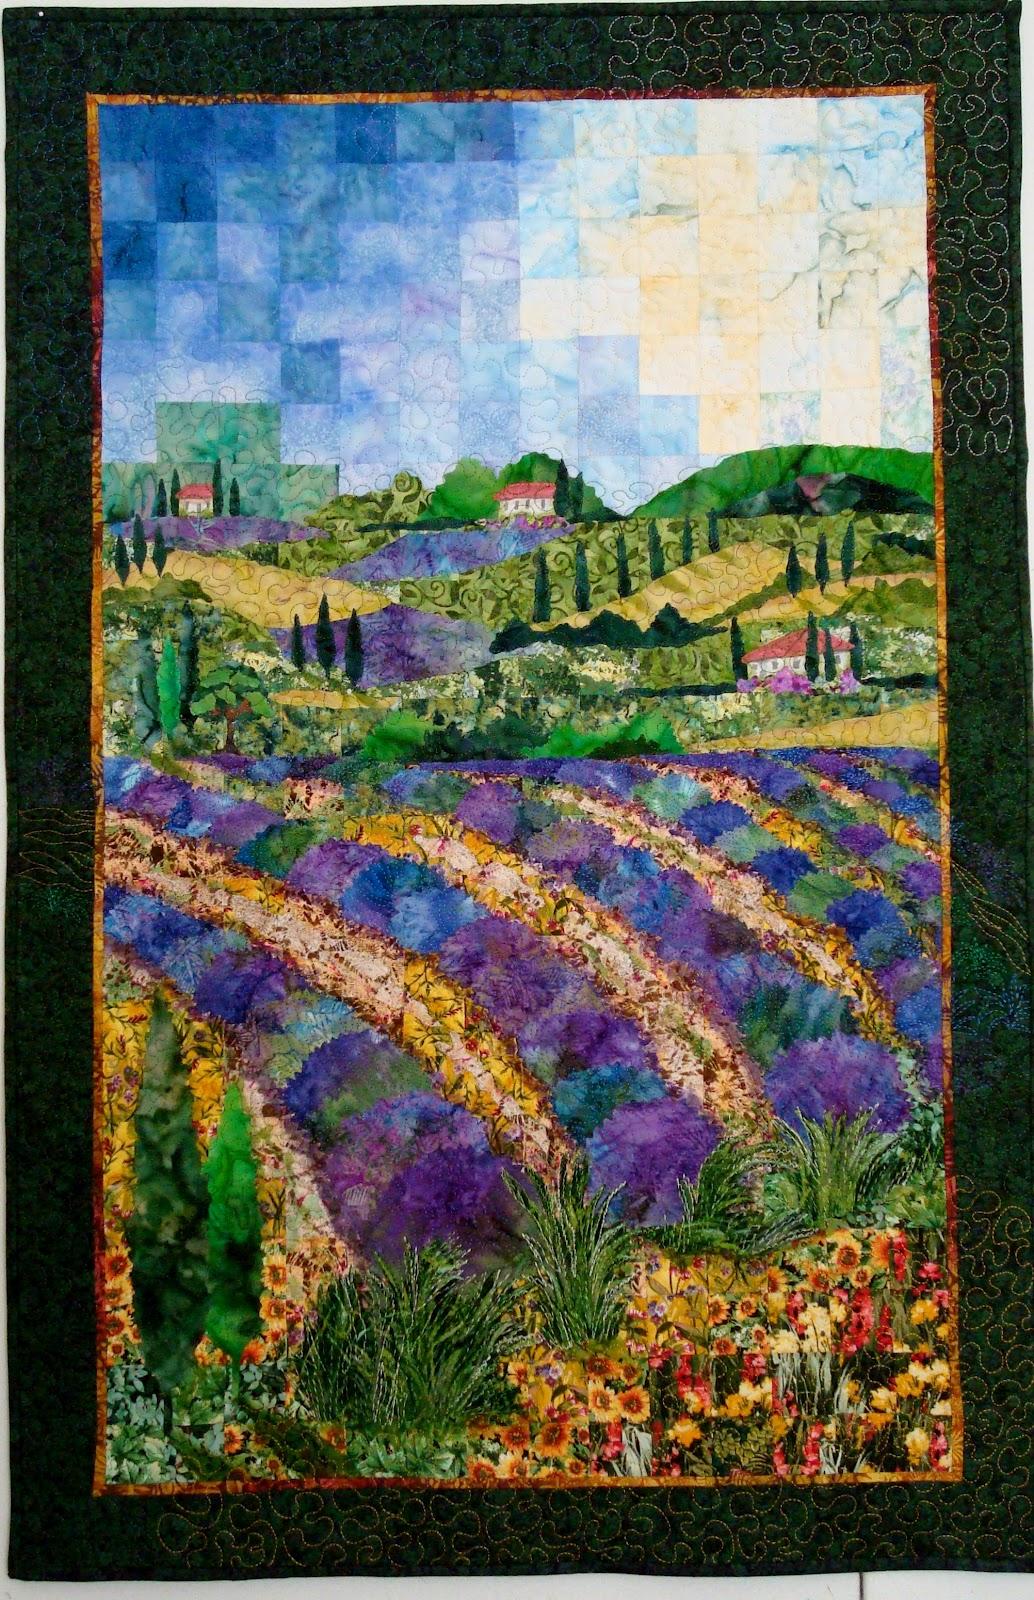 Jane's Garden of Quilts & Beyond: Gallery-Impressionist : impressionist quilts - Adamdwight.com